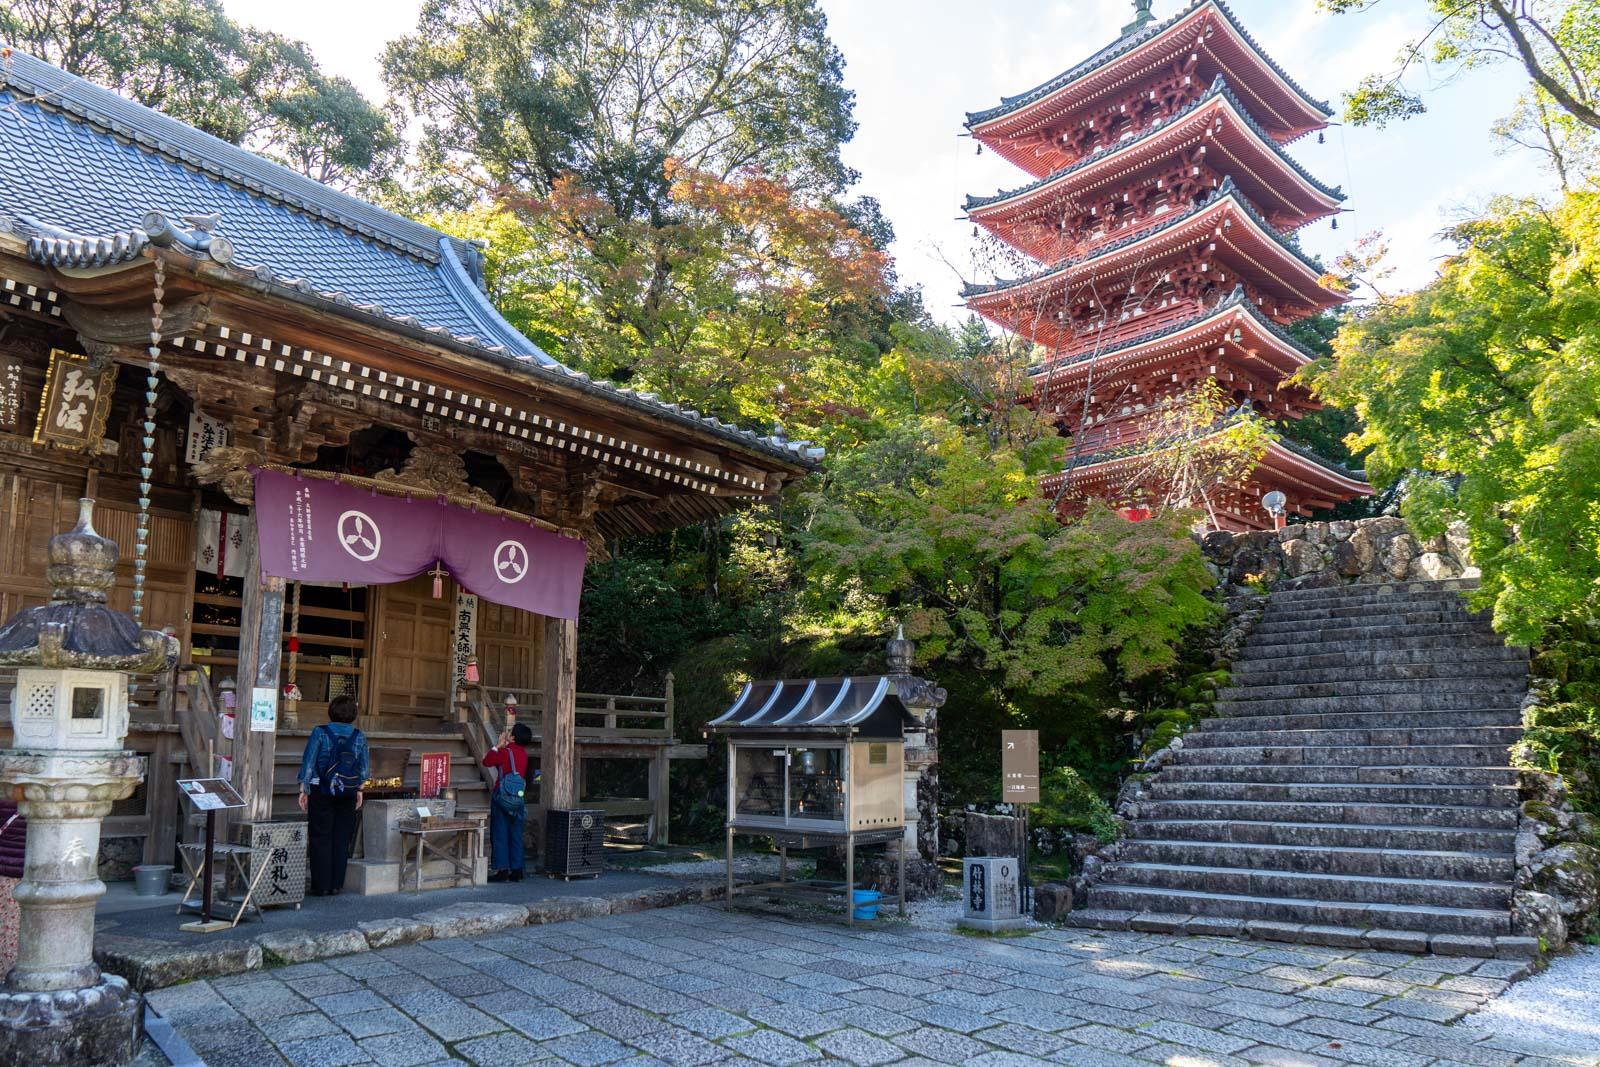 Chikurin-ji Temple, Kochi City, Japan